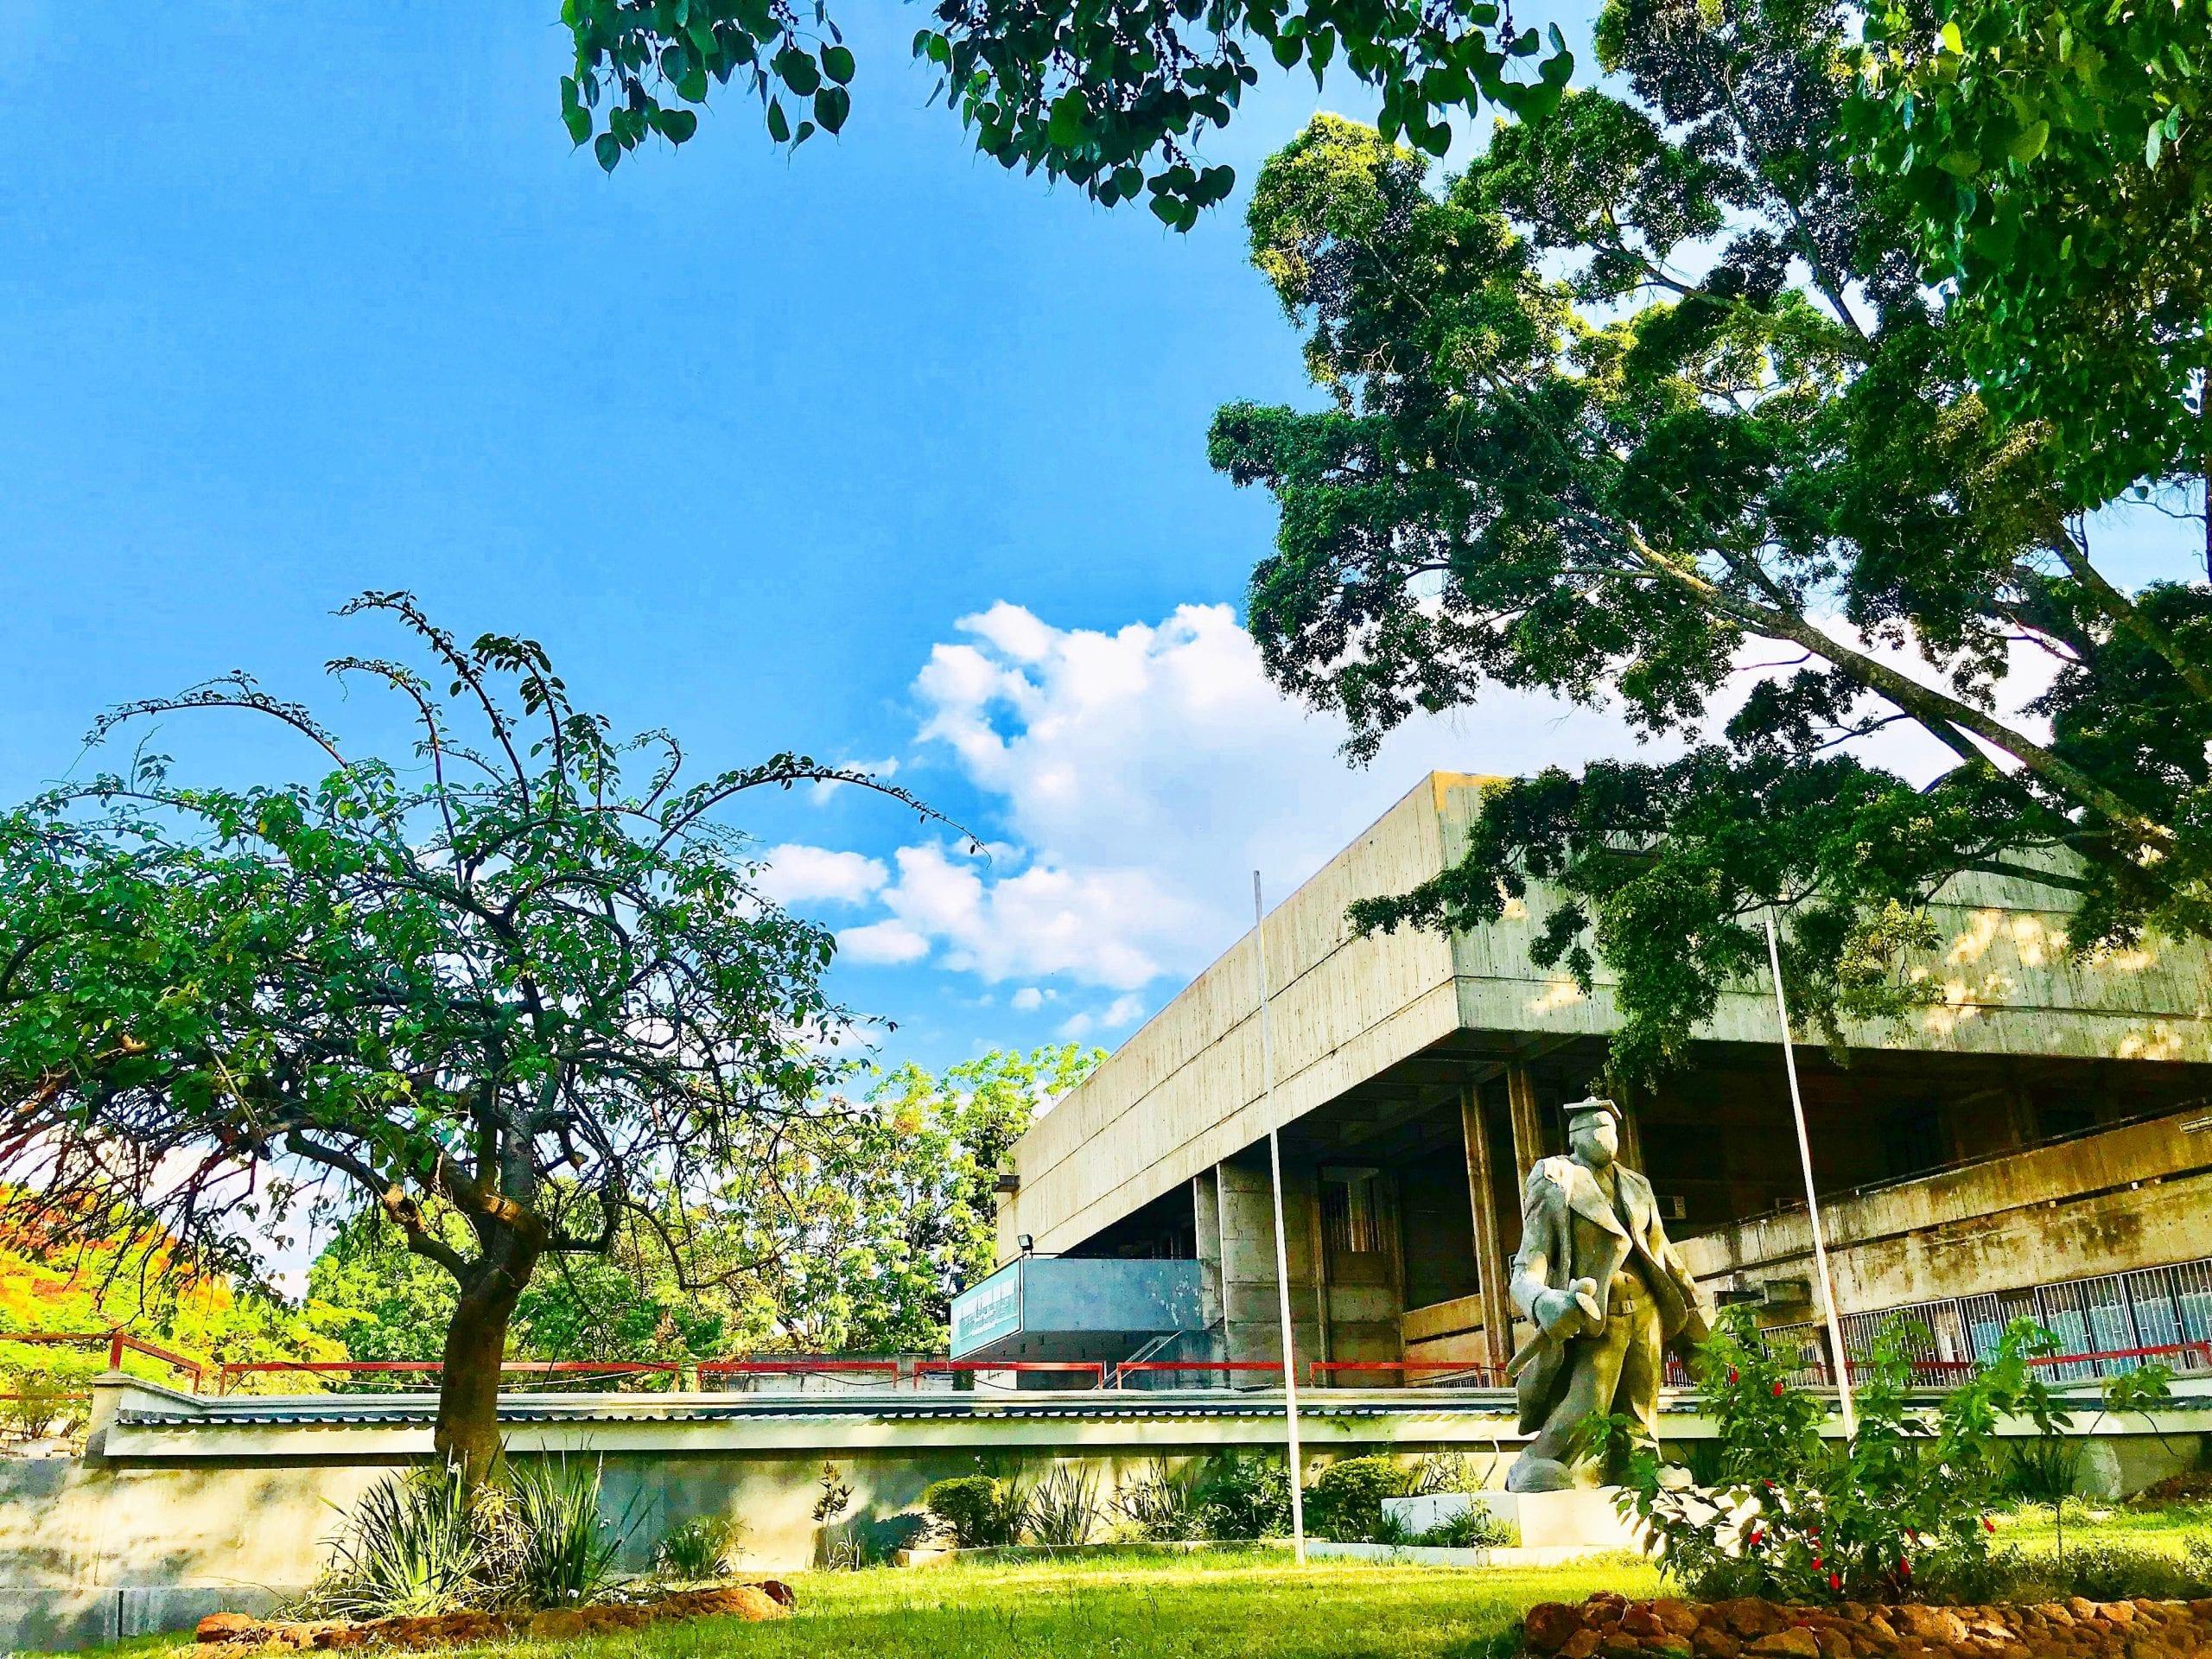 Buildings in Lusaka: University of Zambia